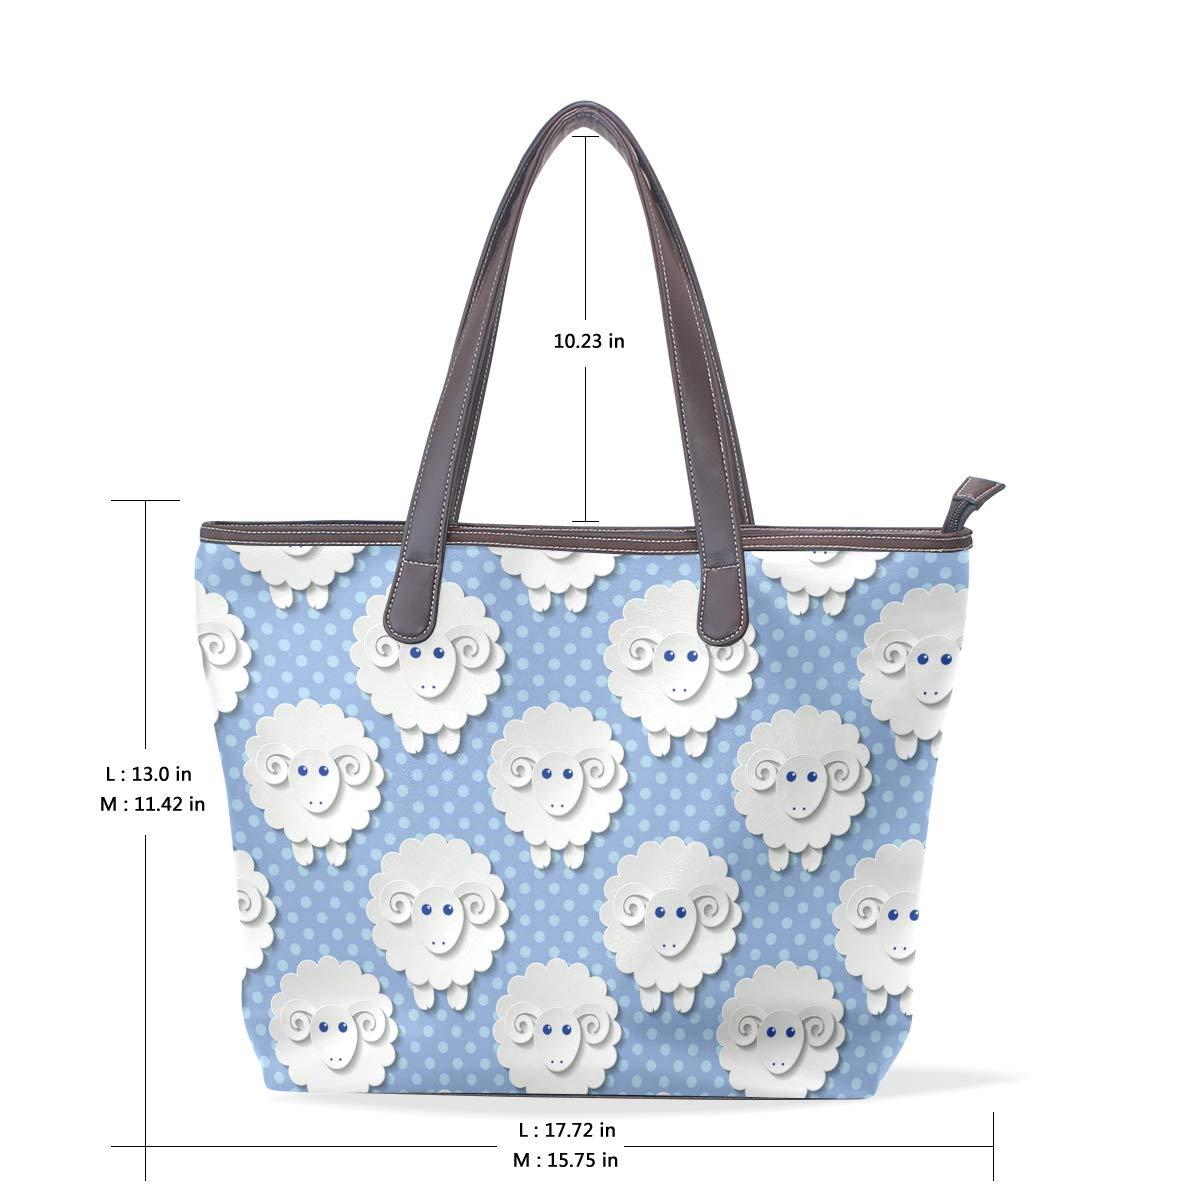 White Sculpture Chic Sheep Womens Leather Handbag Shoulder Bag Satchel Handbags Leather Tote Purse Women Handle Handbags